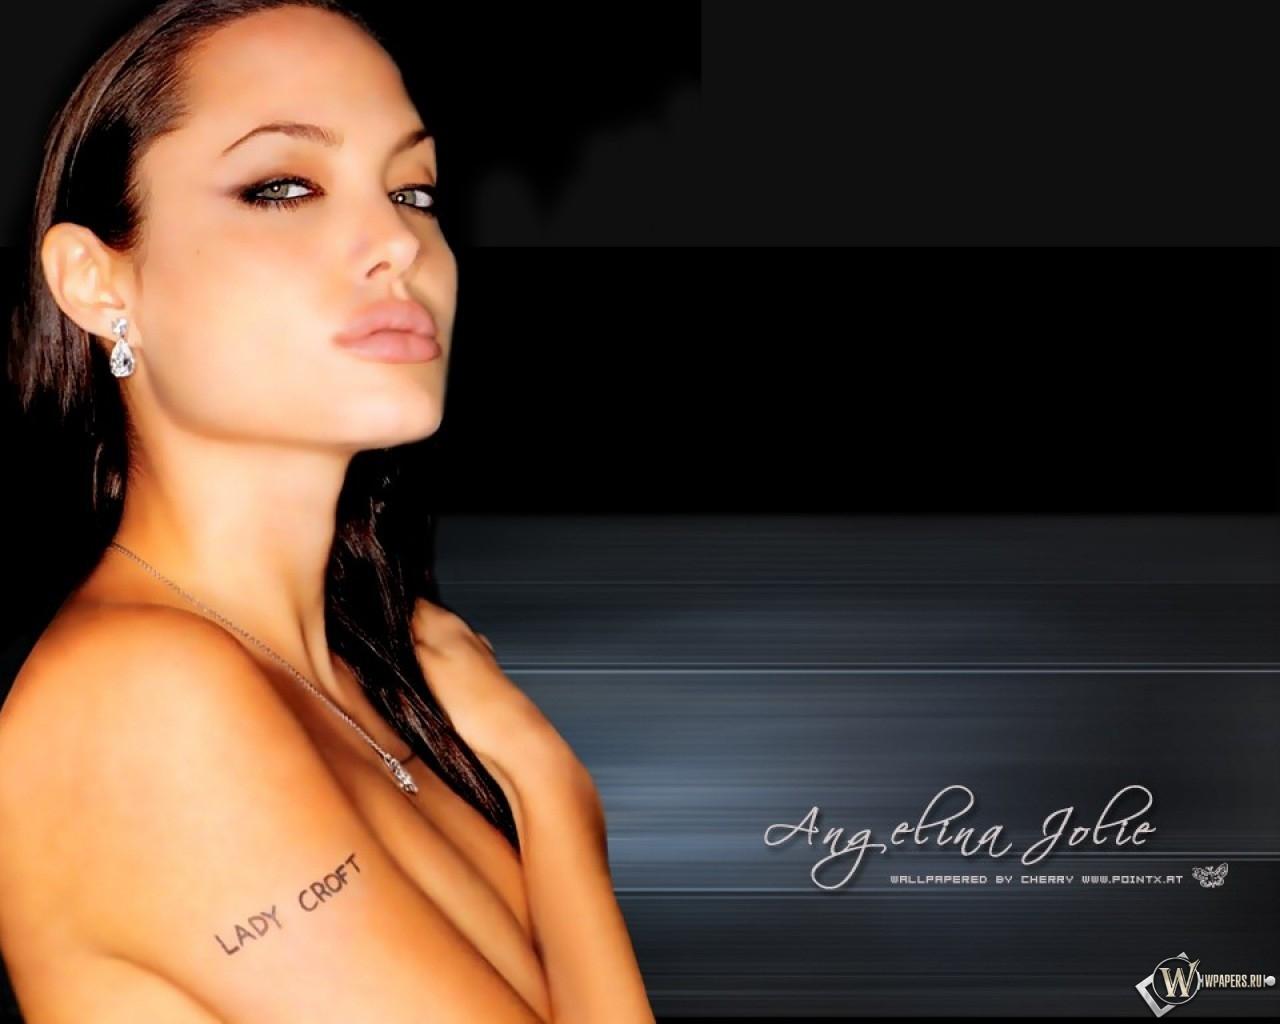 Angelina Jolie 1280x1024